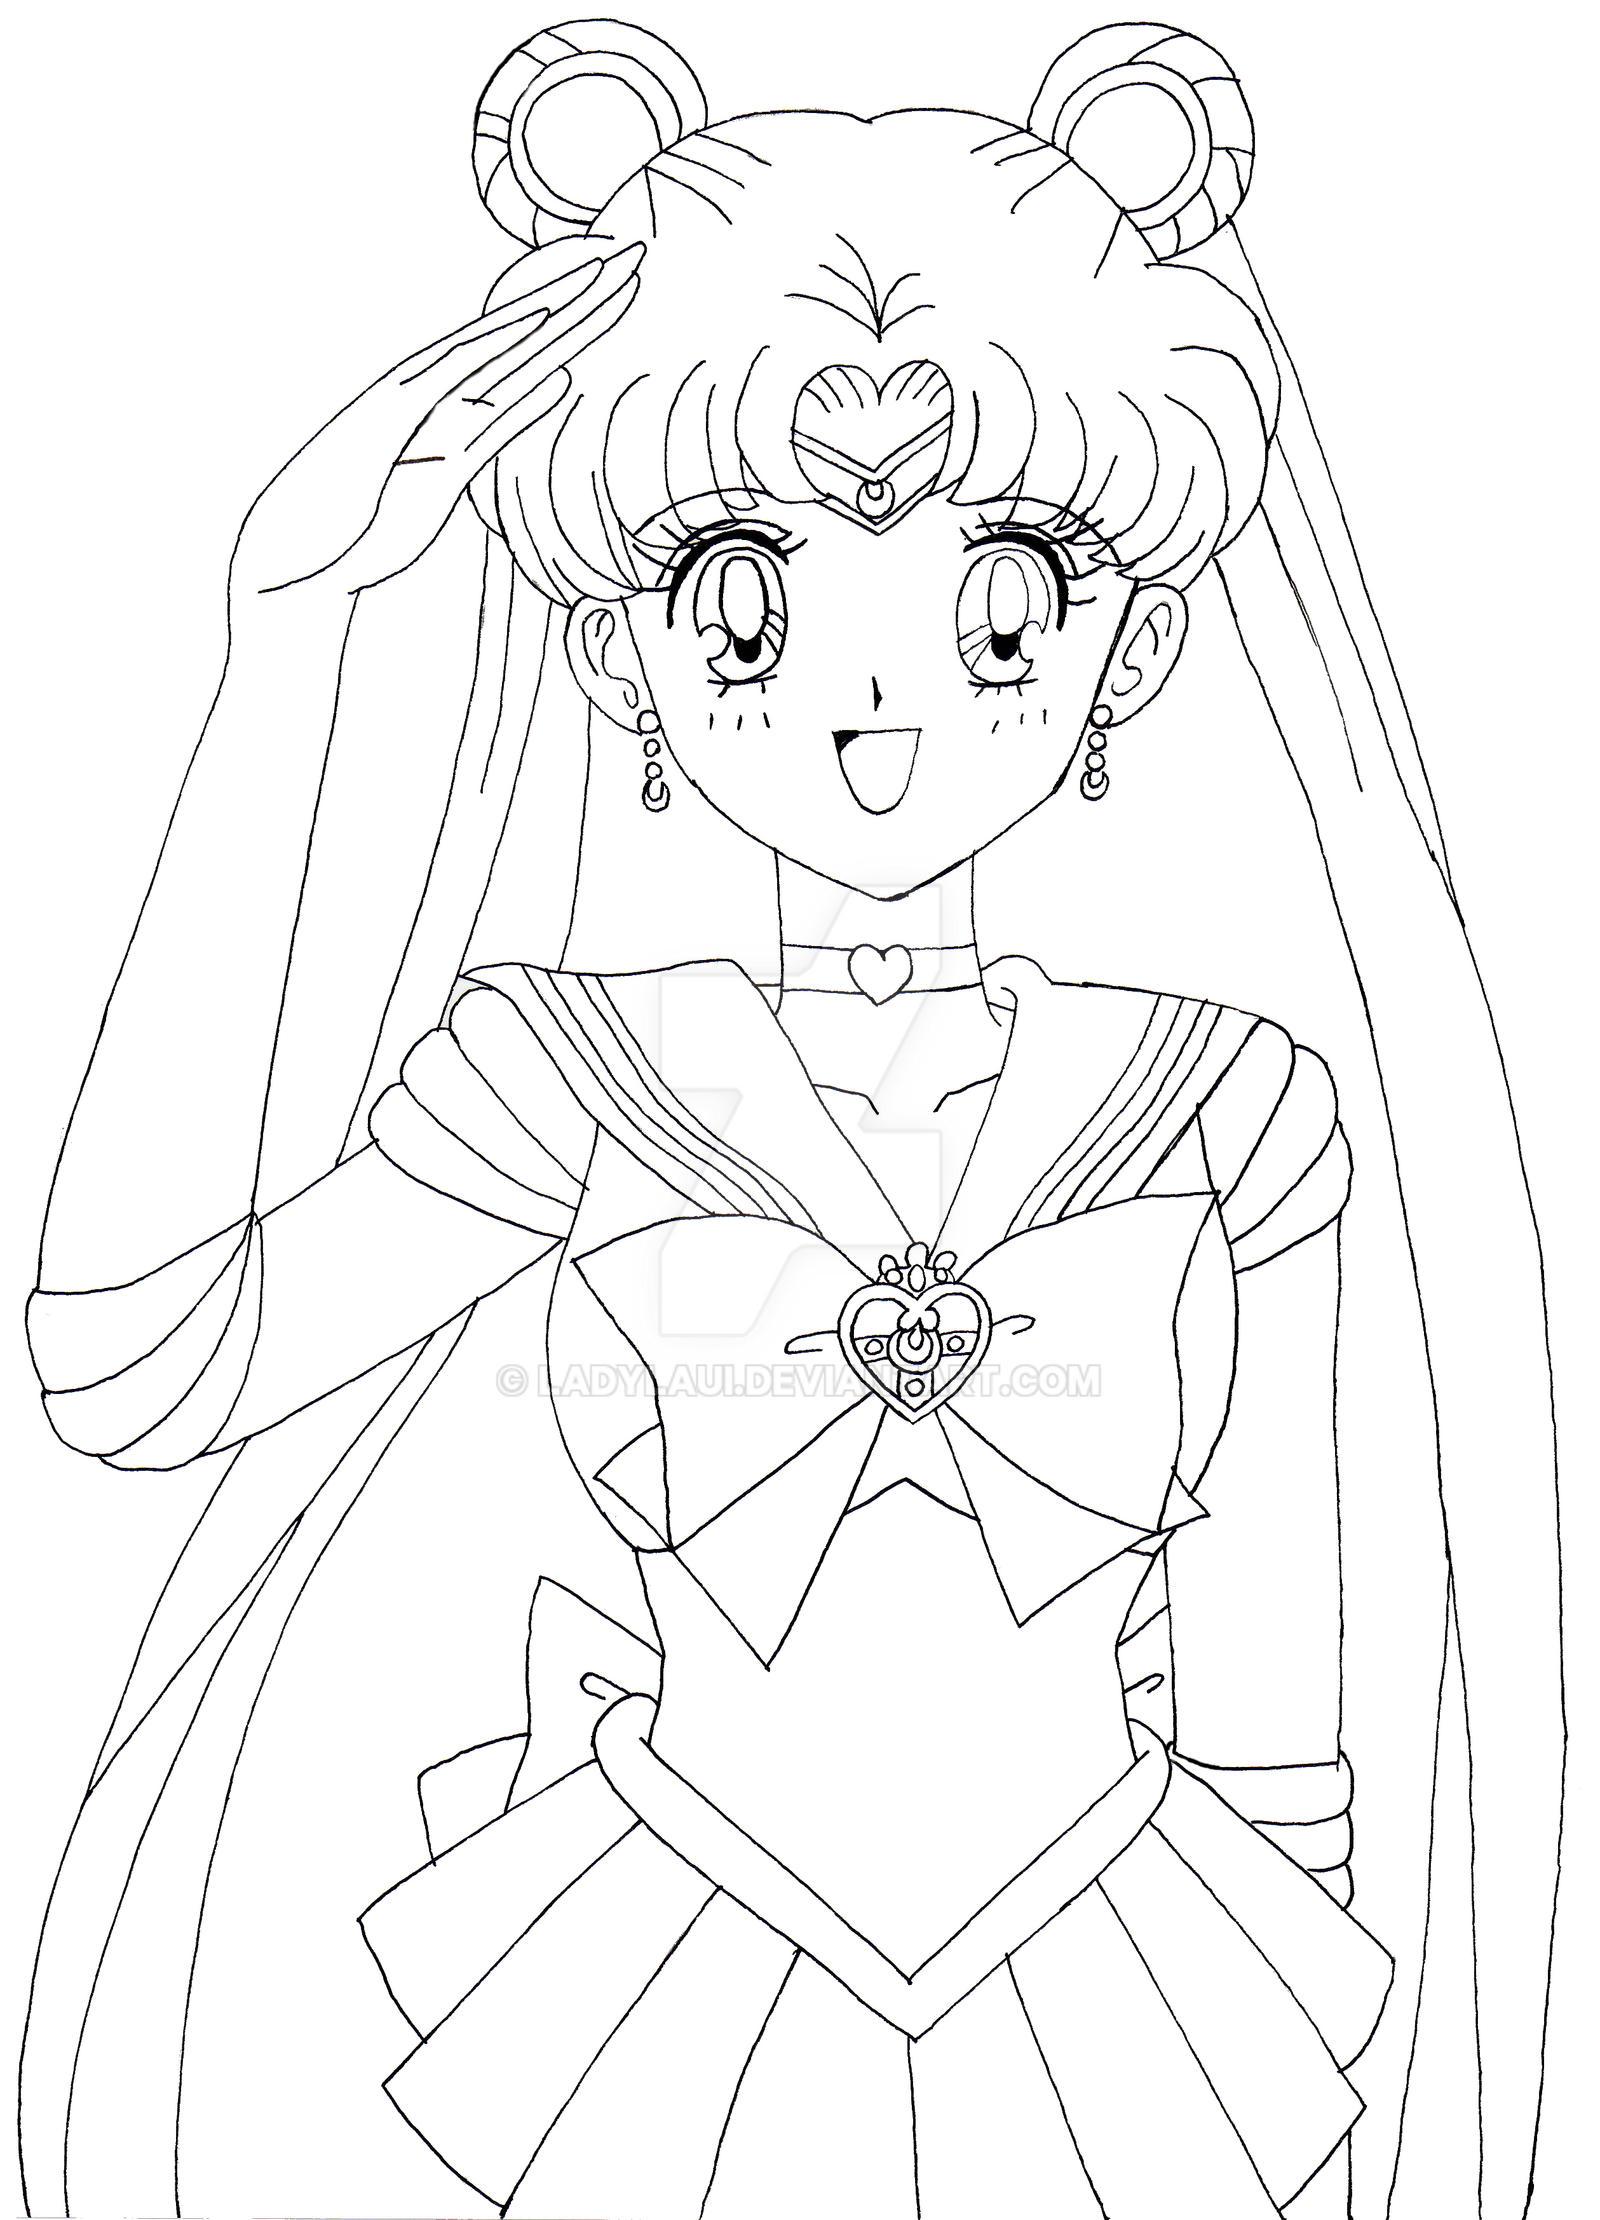 Line Art Resolution : Lineart sailor moon cosmic heart brooch by ladylaui on